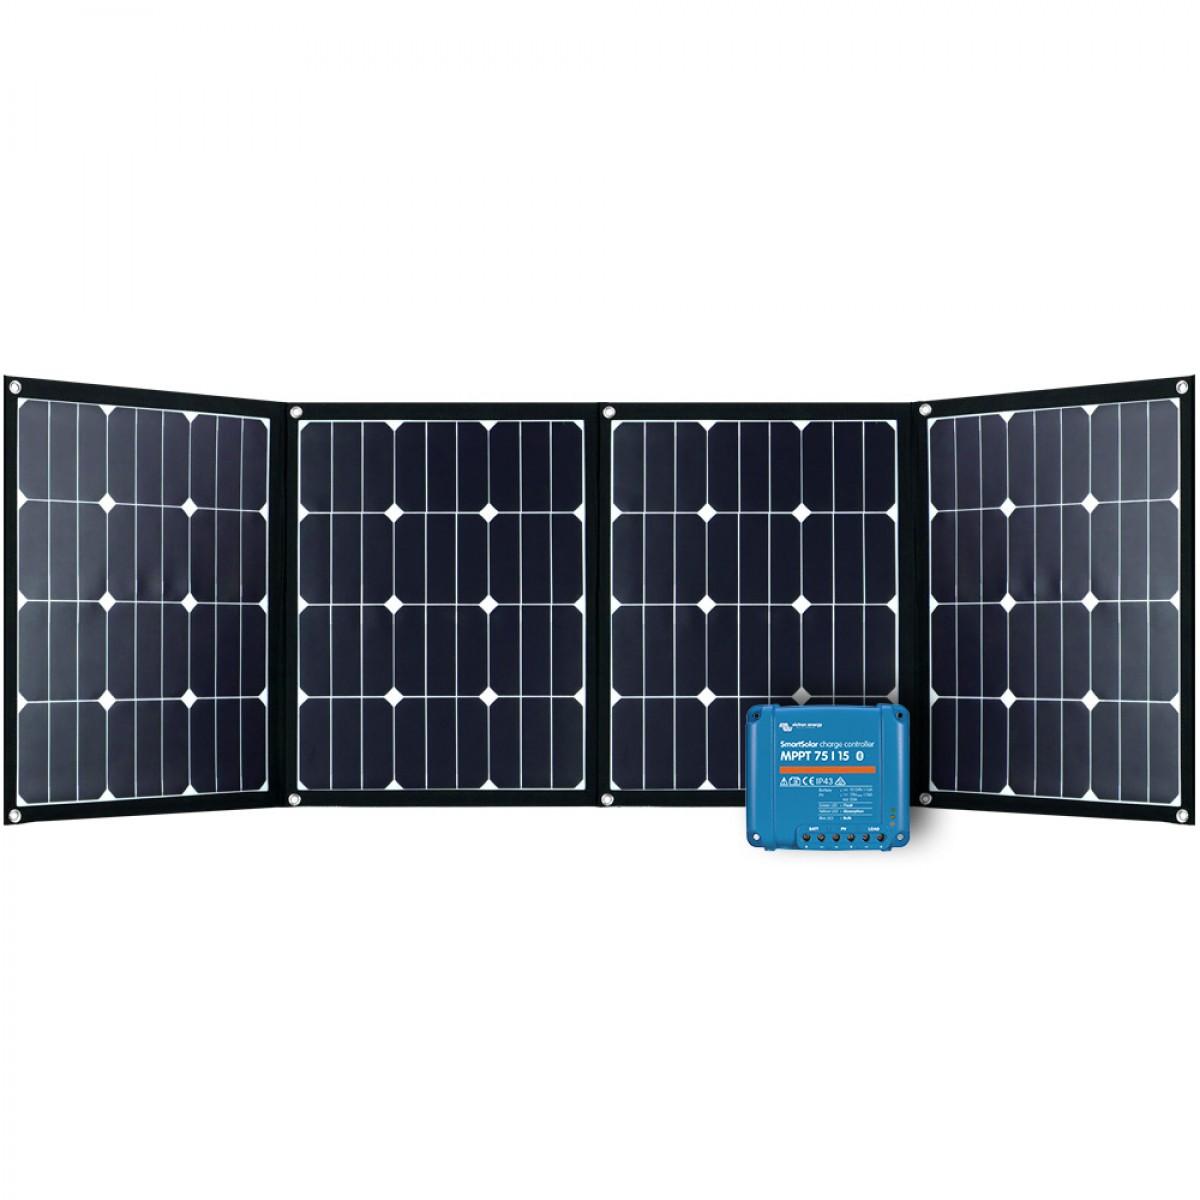 Faltmodul 4x40Wp mit MPPT Solarladeregler 4